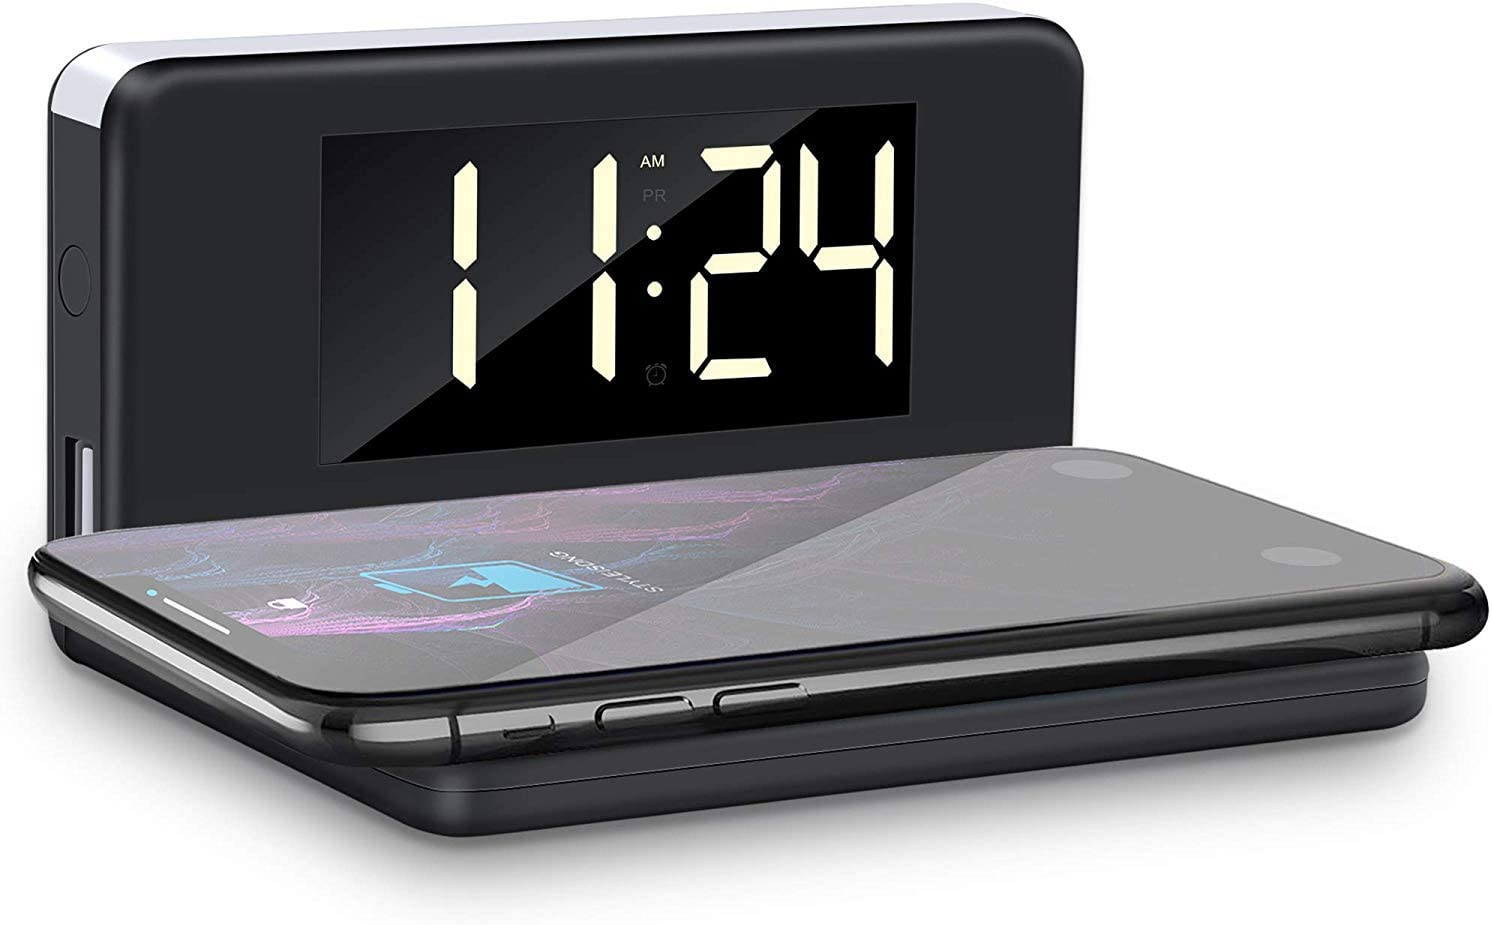 Kadeva Cargador inalambrico movil Despertador Reloj Digital luz Nocturna Carga rapida 10W Negro